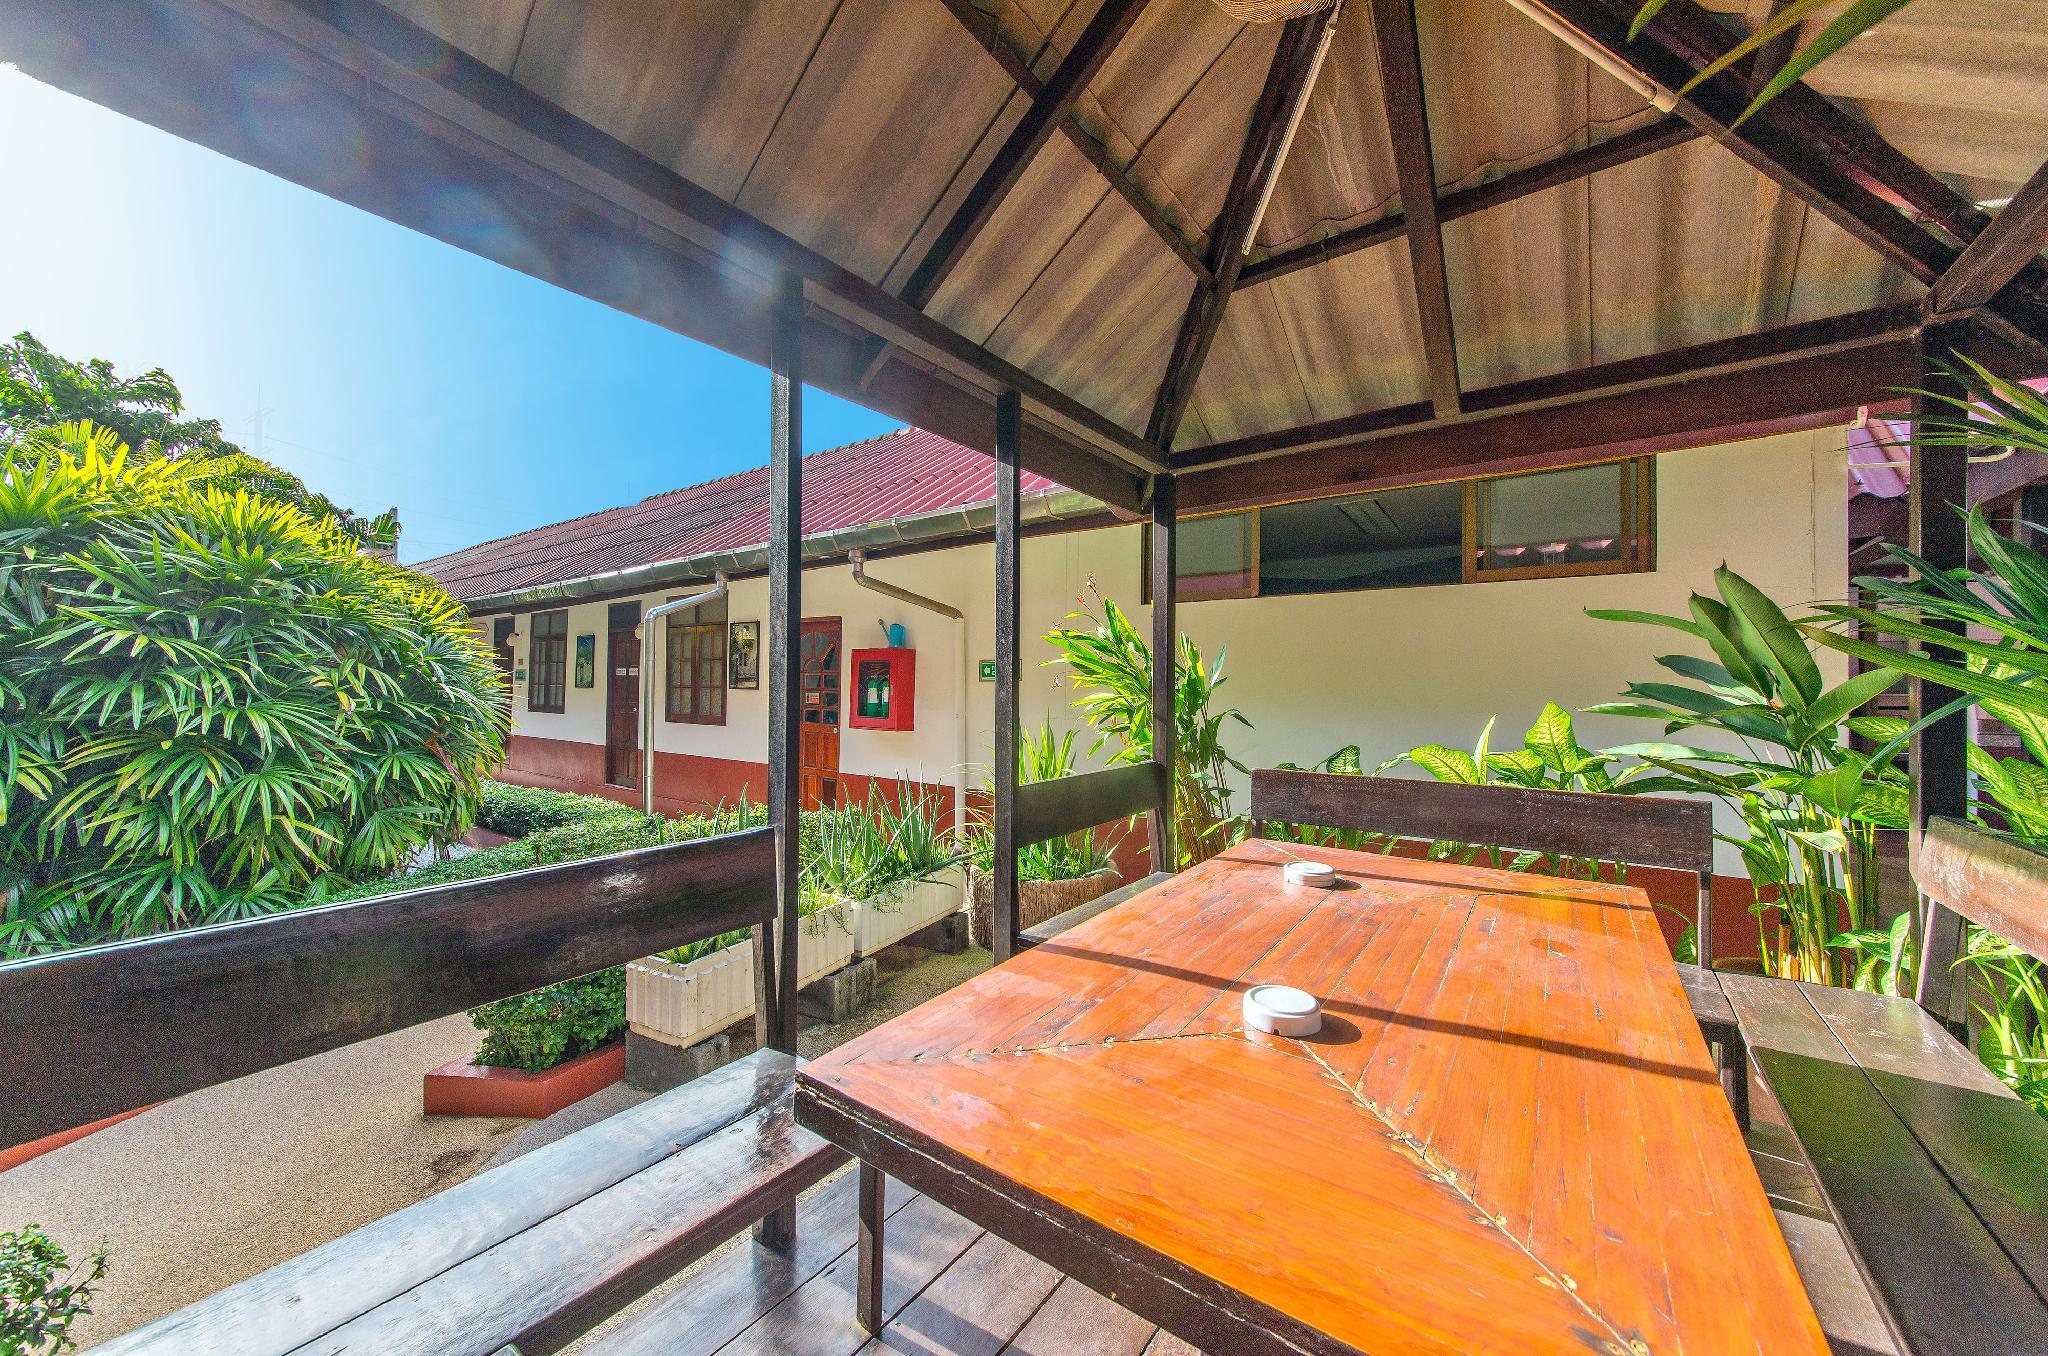 Ordinary Double Room At Patong Beach Phuket Island